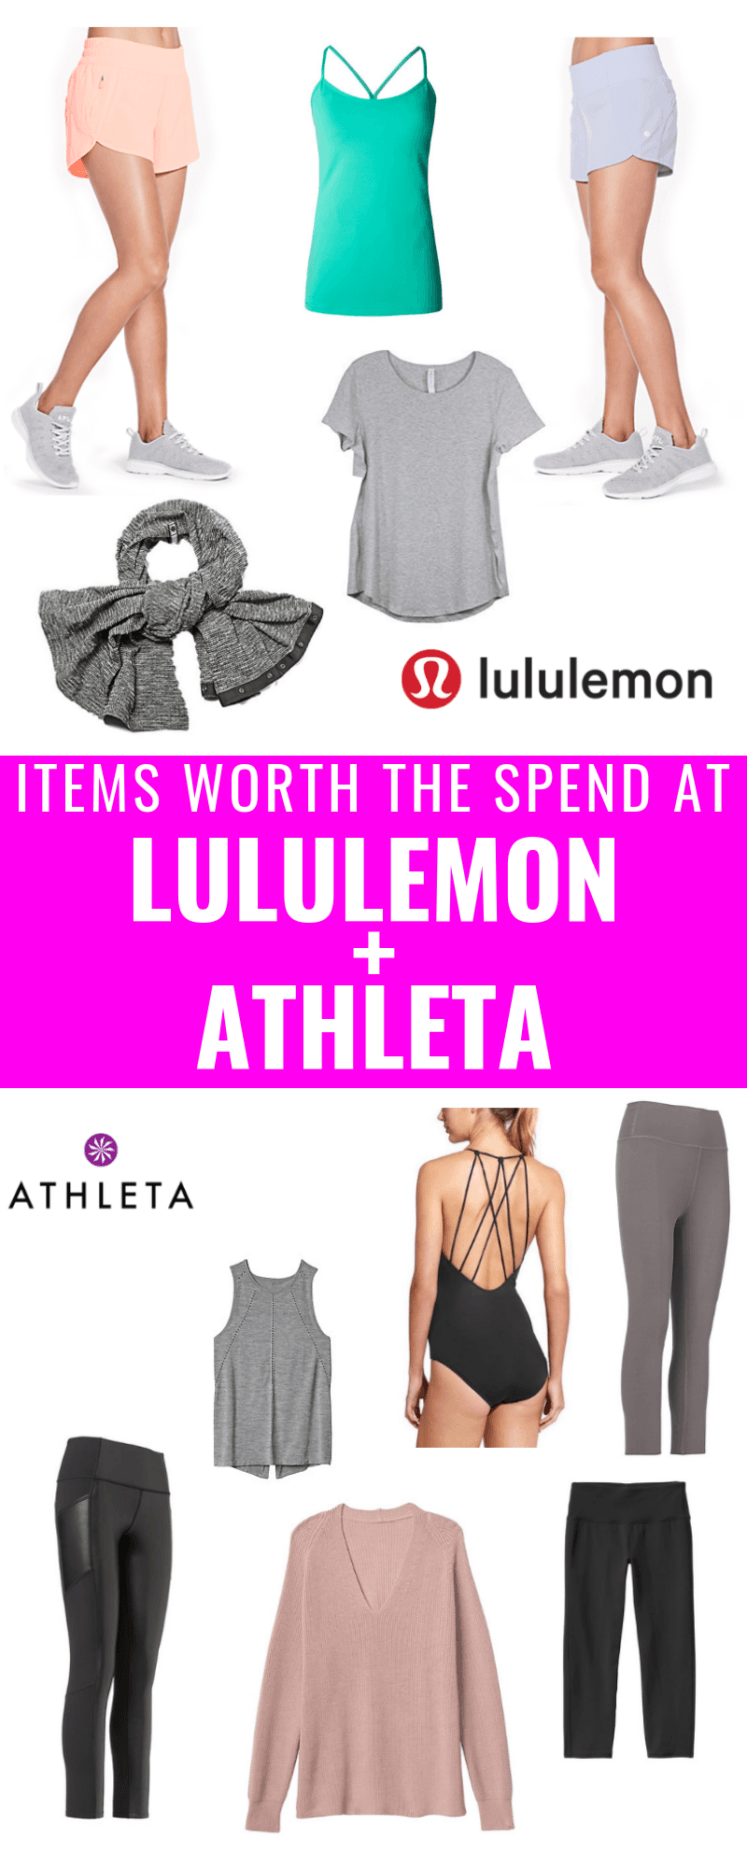 Items Worth The Spend At Lululemon + Athleta - Items Worth The Spend At Lululemon - Items Worth The Spend At Athleta- Fitness - Shopping - Communikait by Kait Hanson